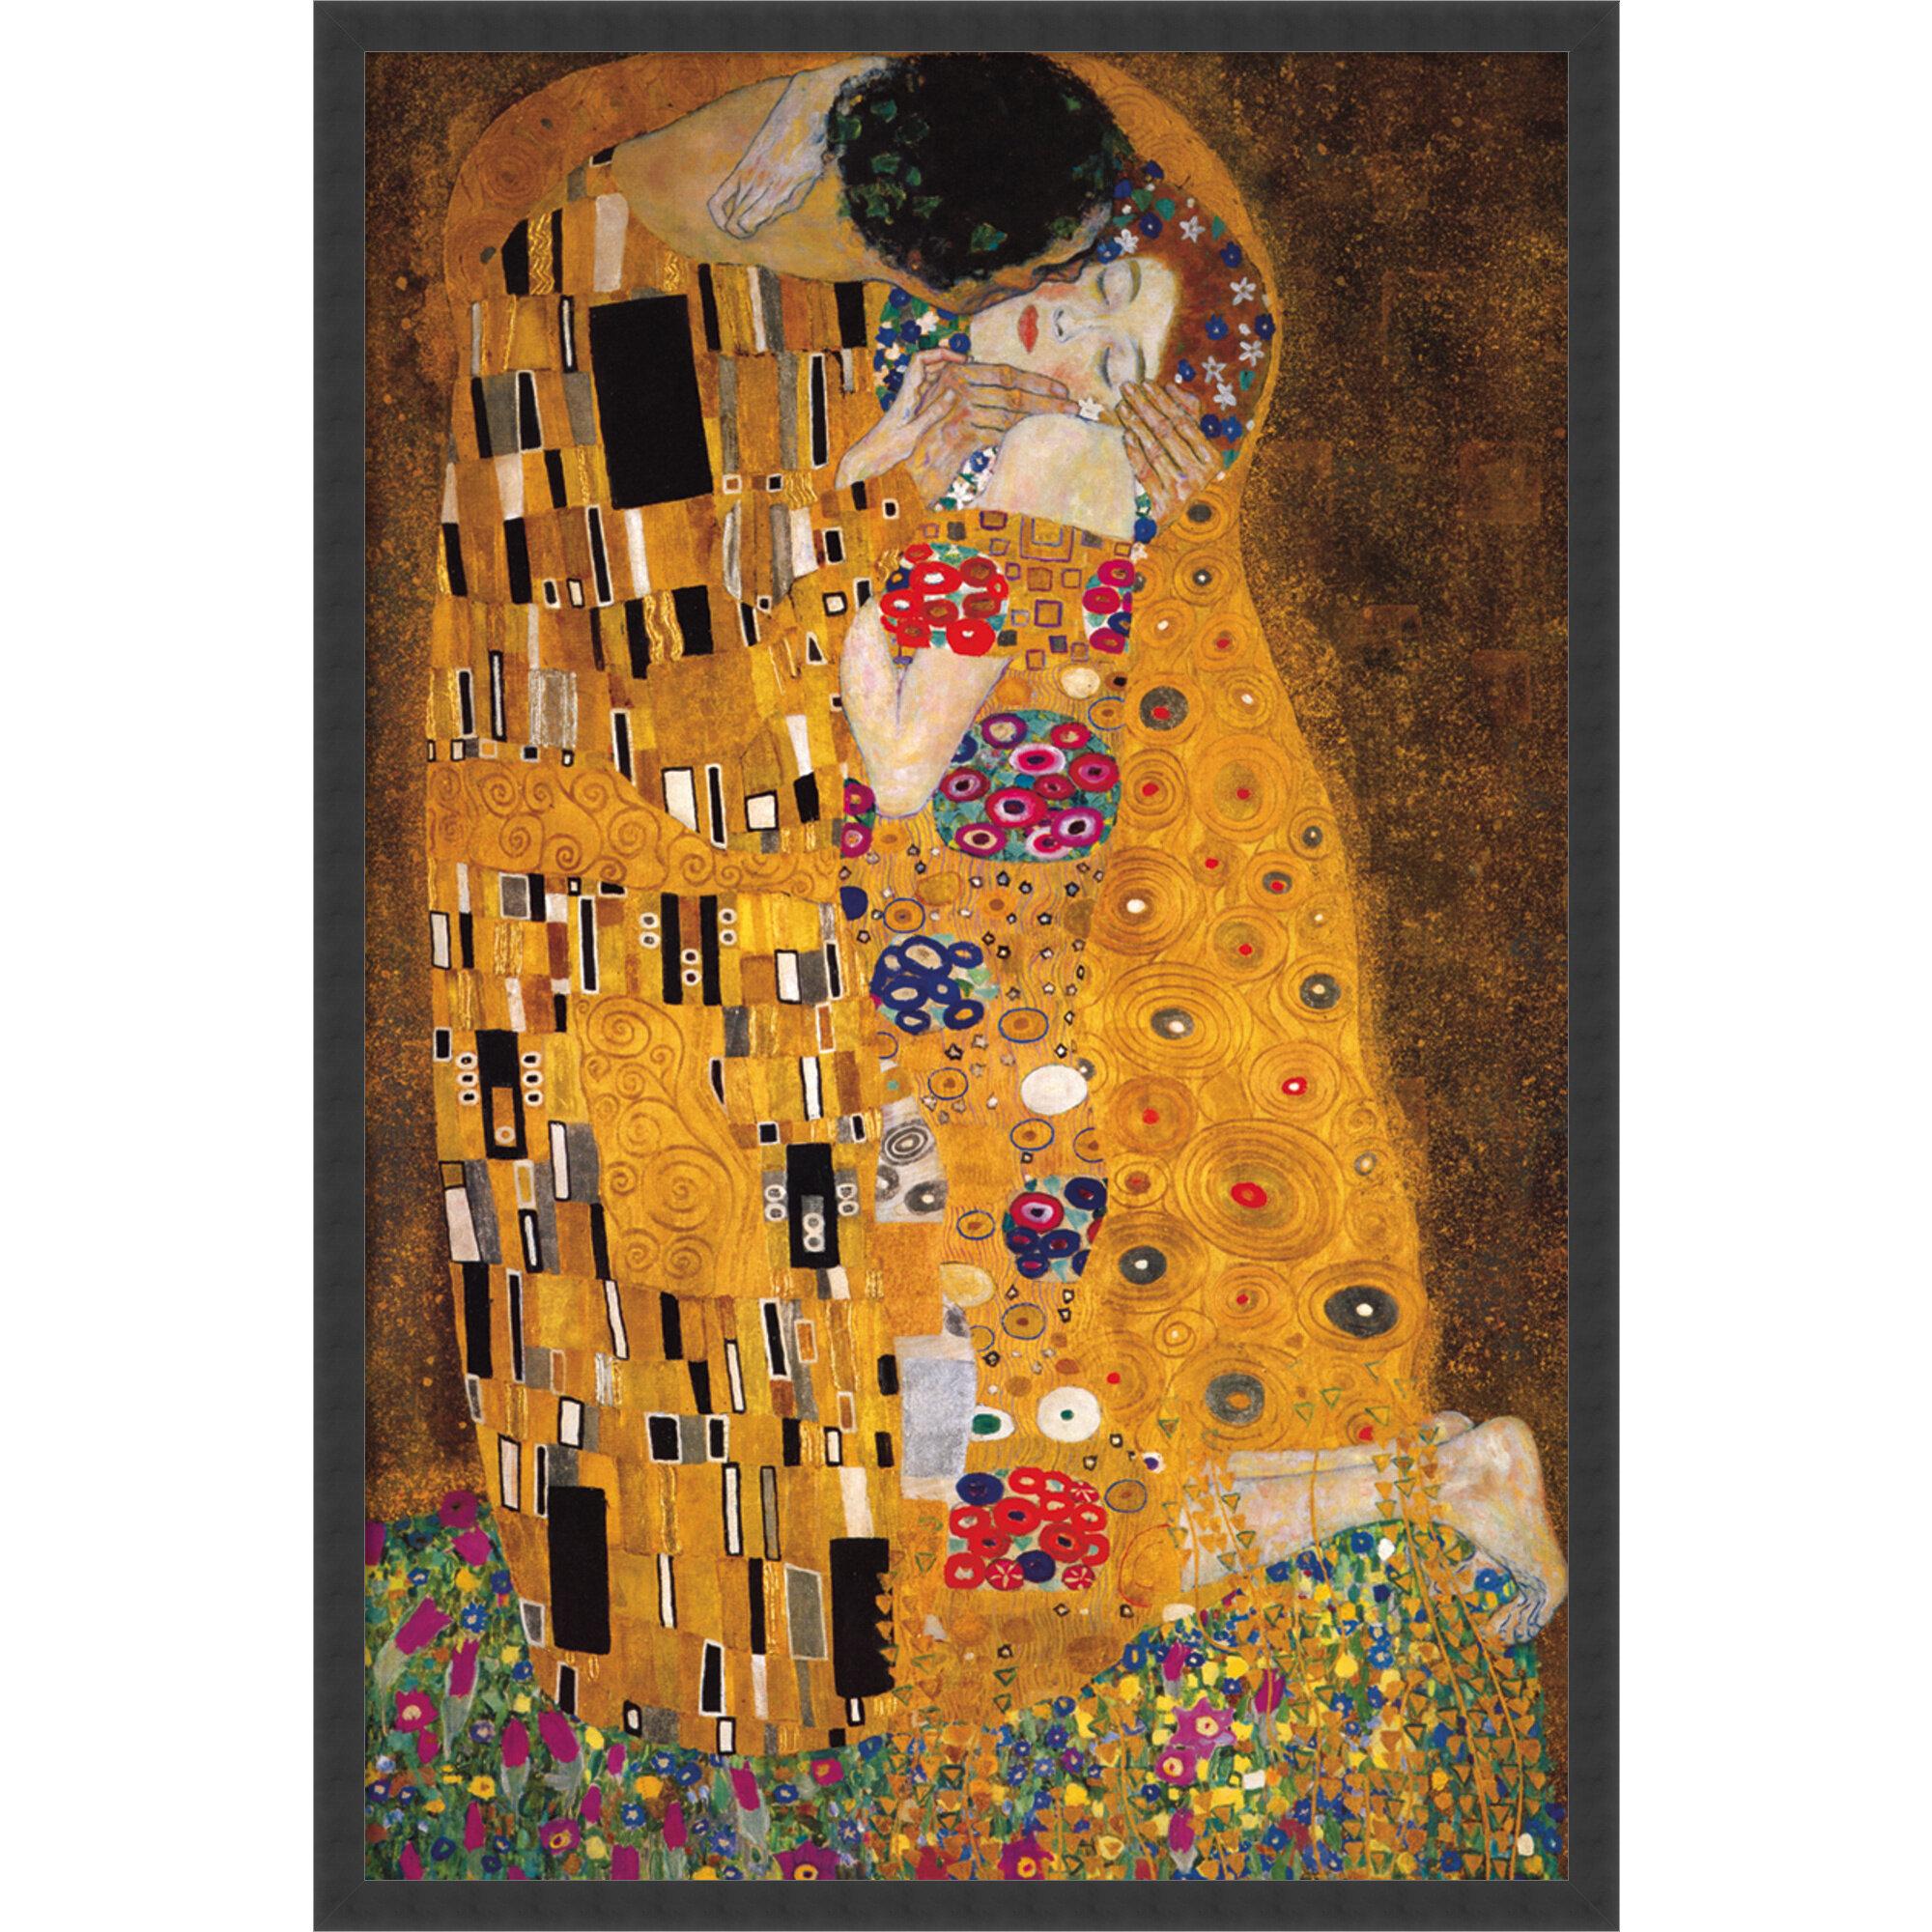 Gustav Klimt A4 size 21x29.7cm QUALITY Canvas Art Print Unframed The Kiss